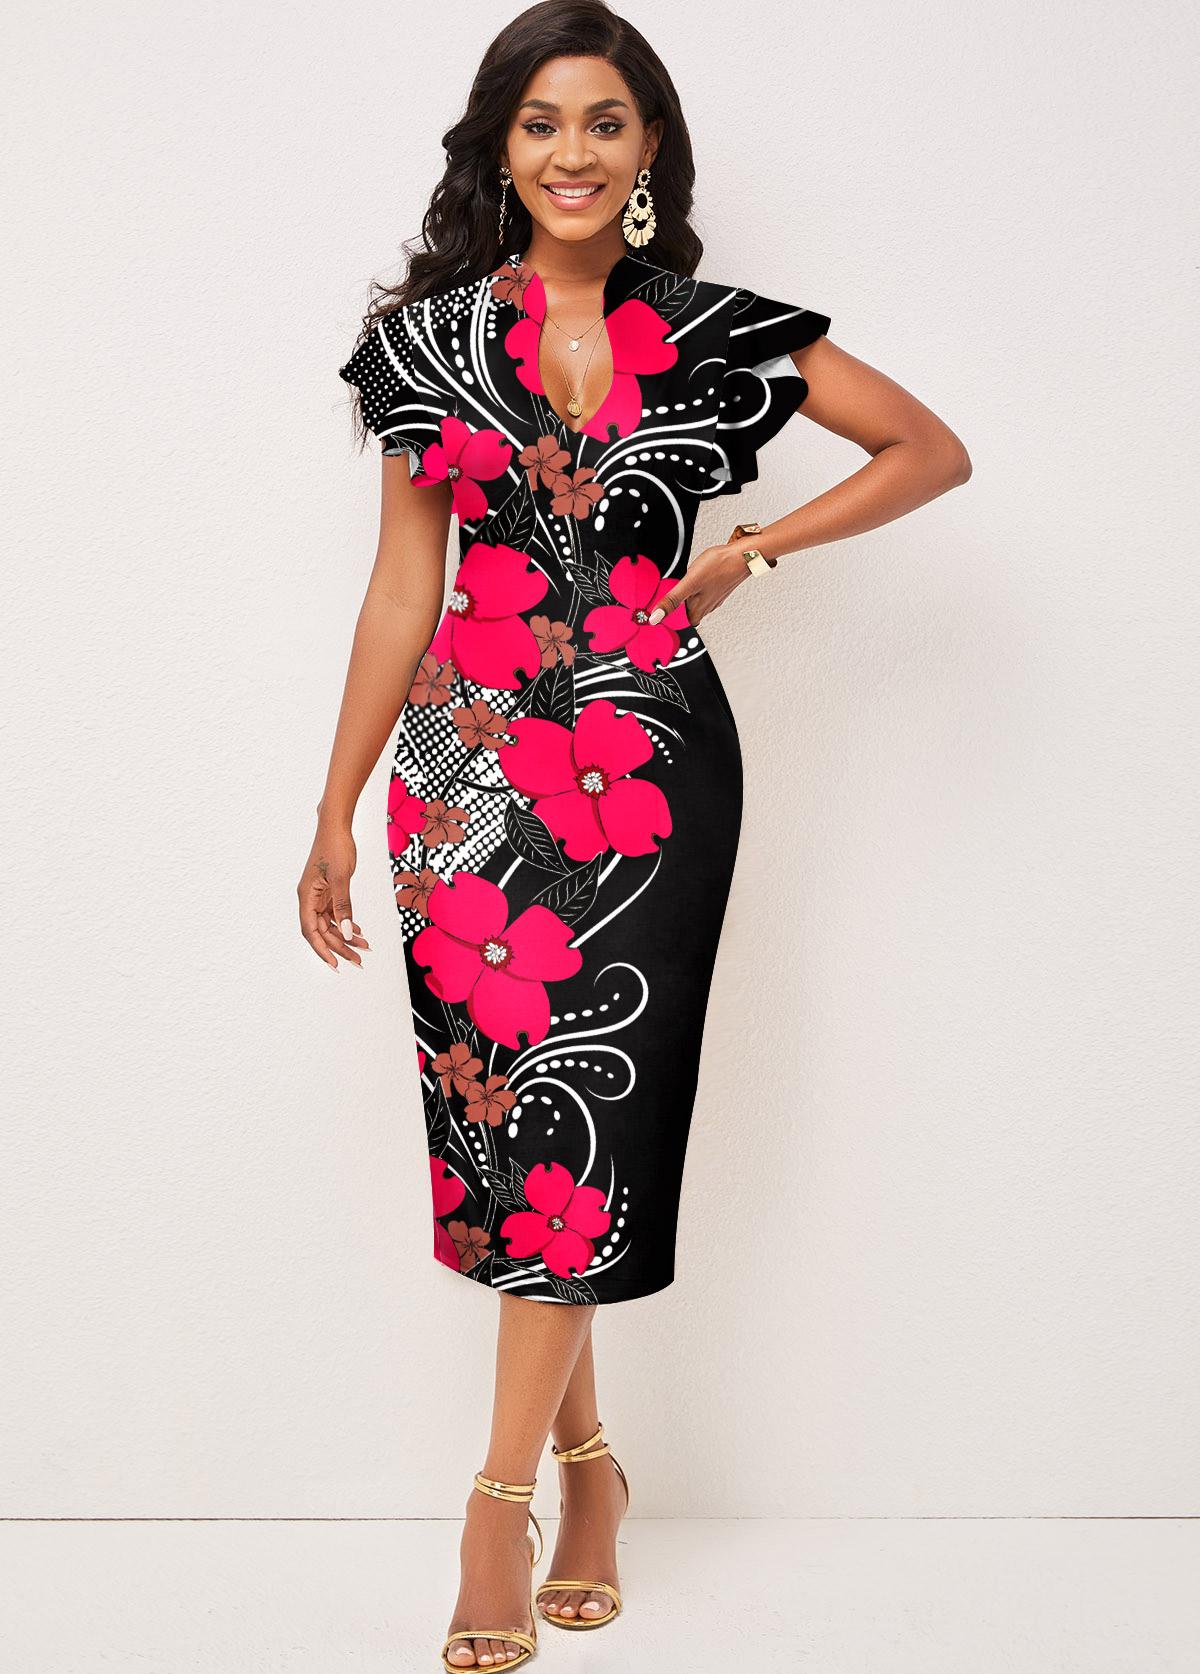 Floral Print Short Sleeve Contrast Dress